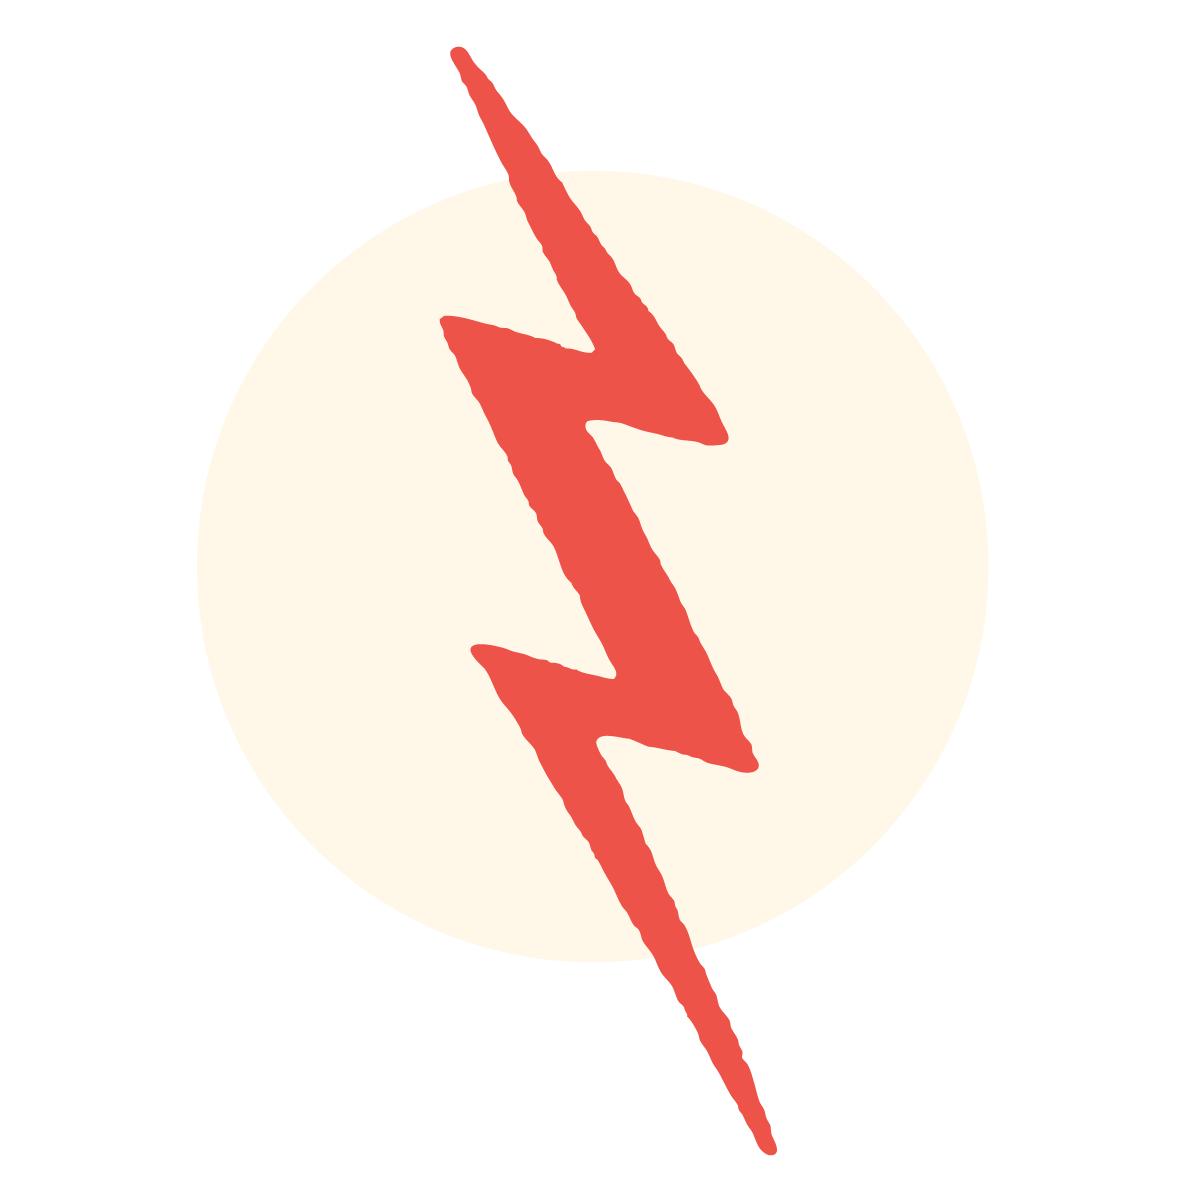 julia-sumpter-logo-4.png